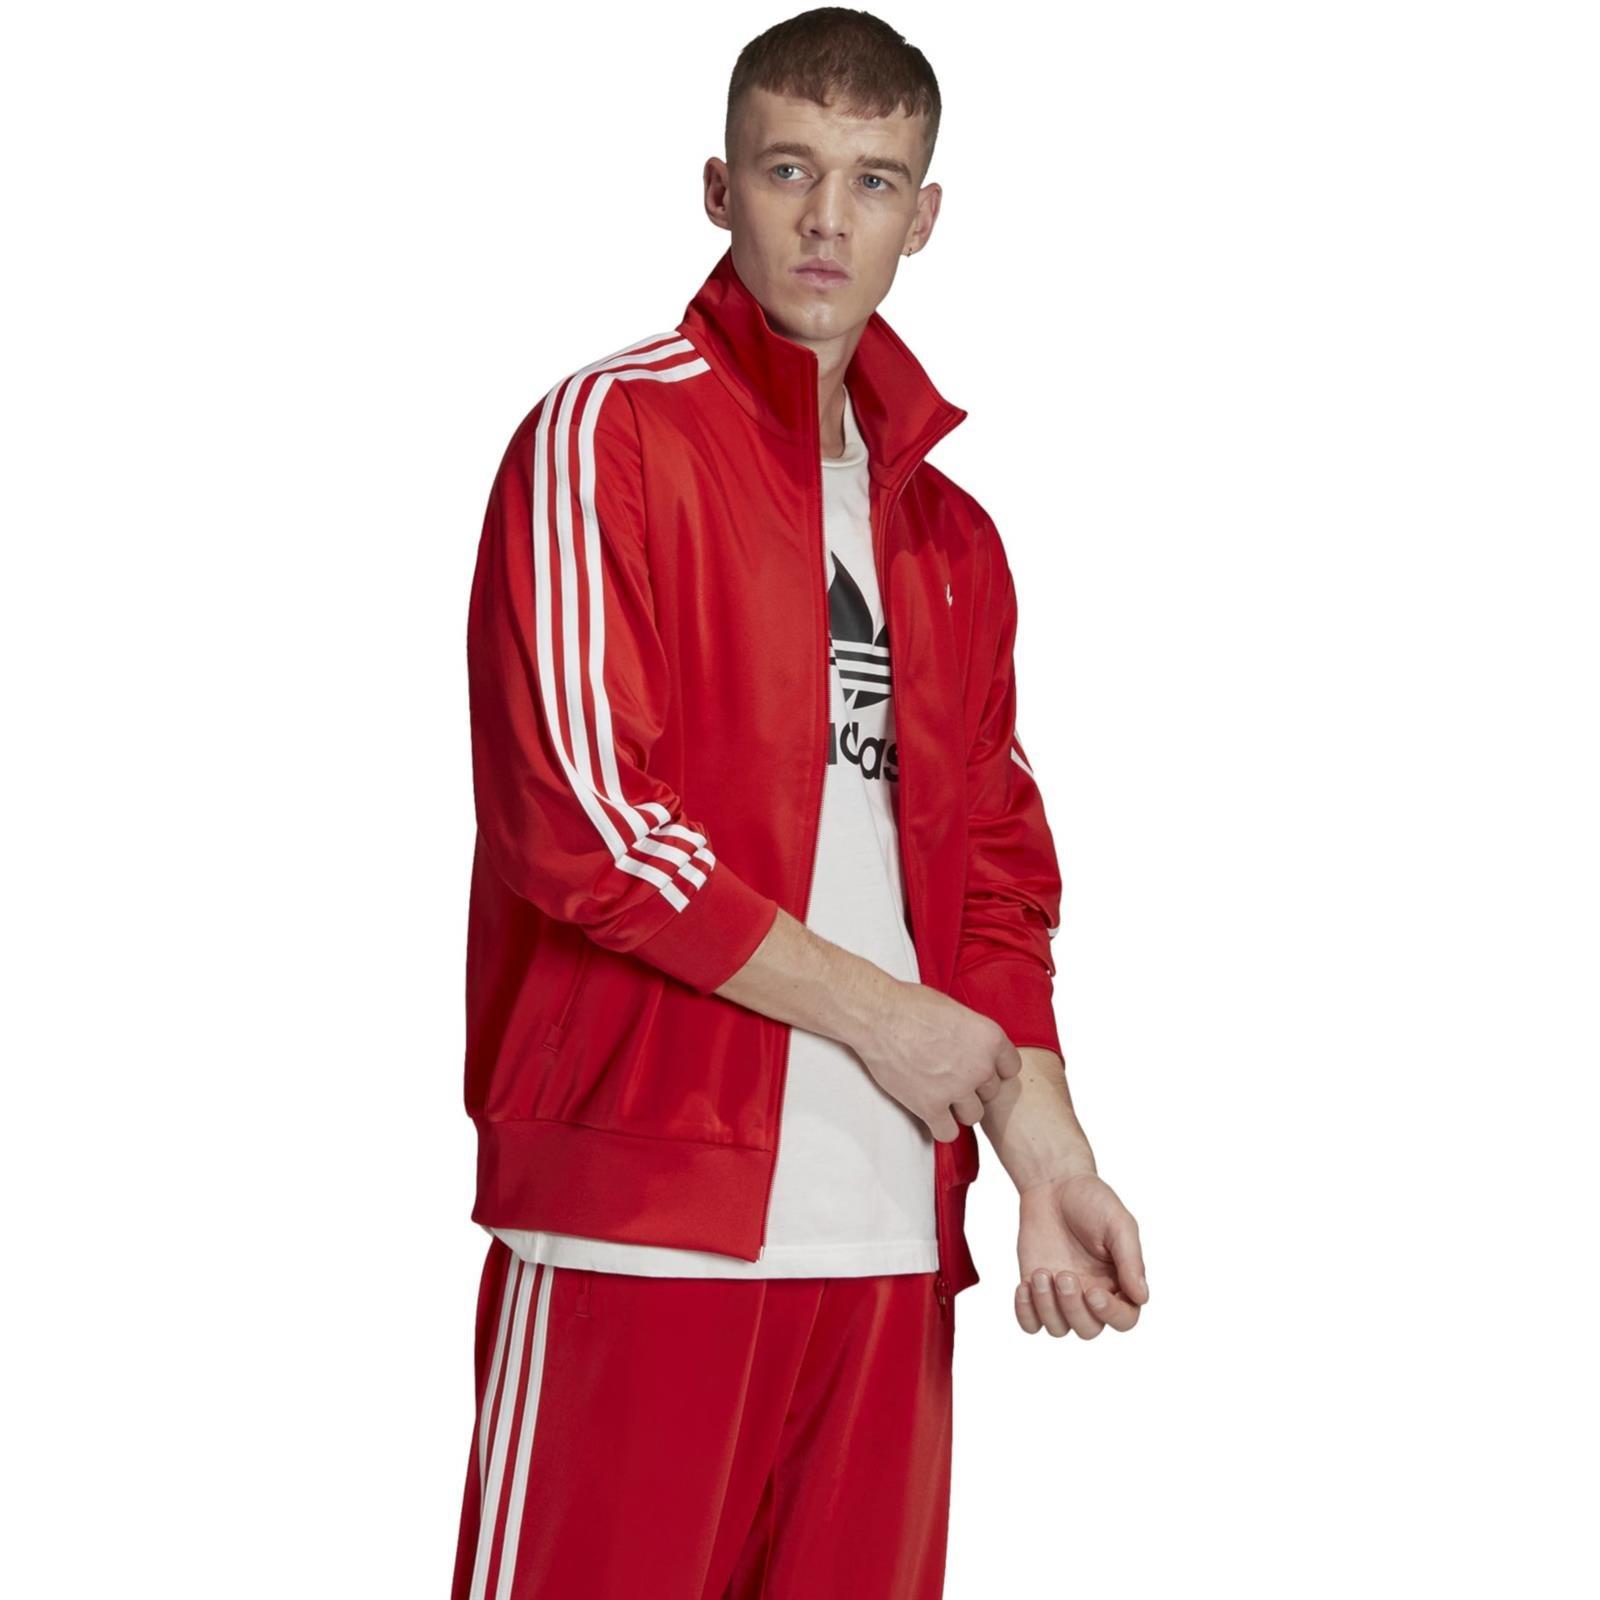 Bluza męska adidas Originals FIREBIRD TT czerwona FM3811